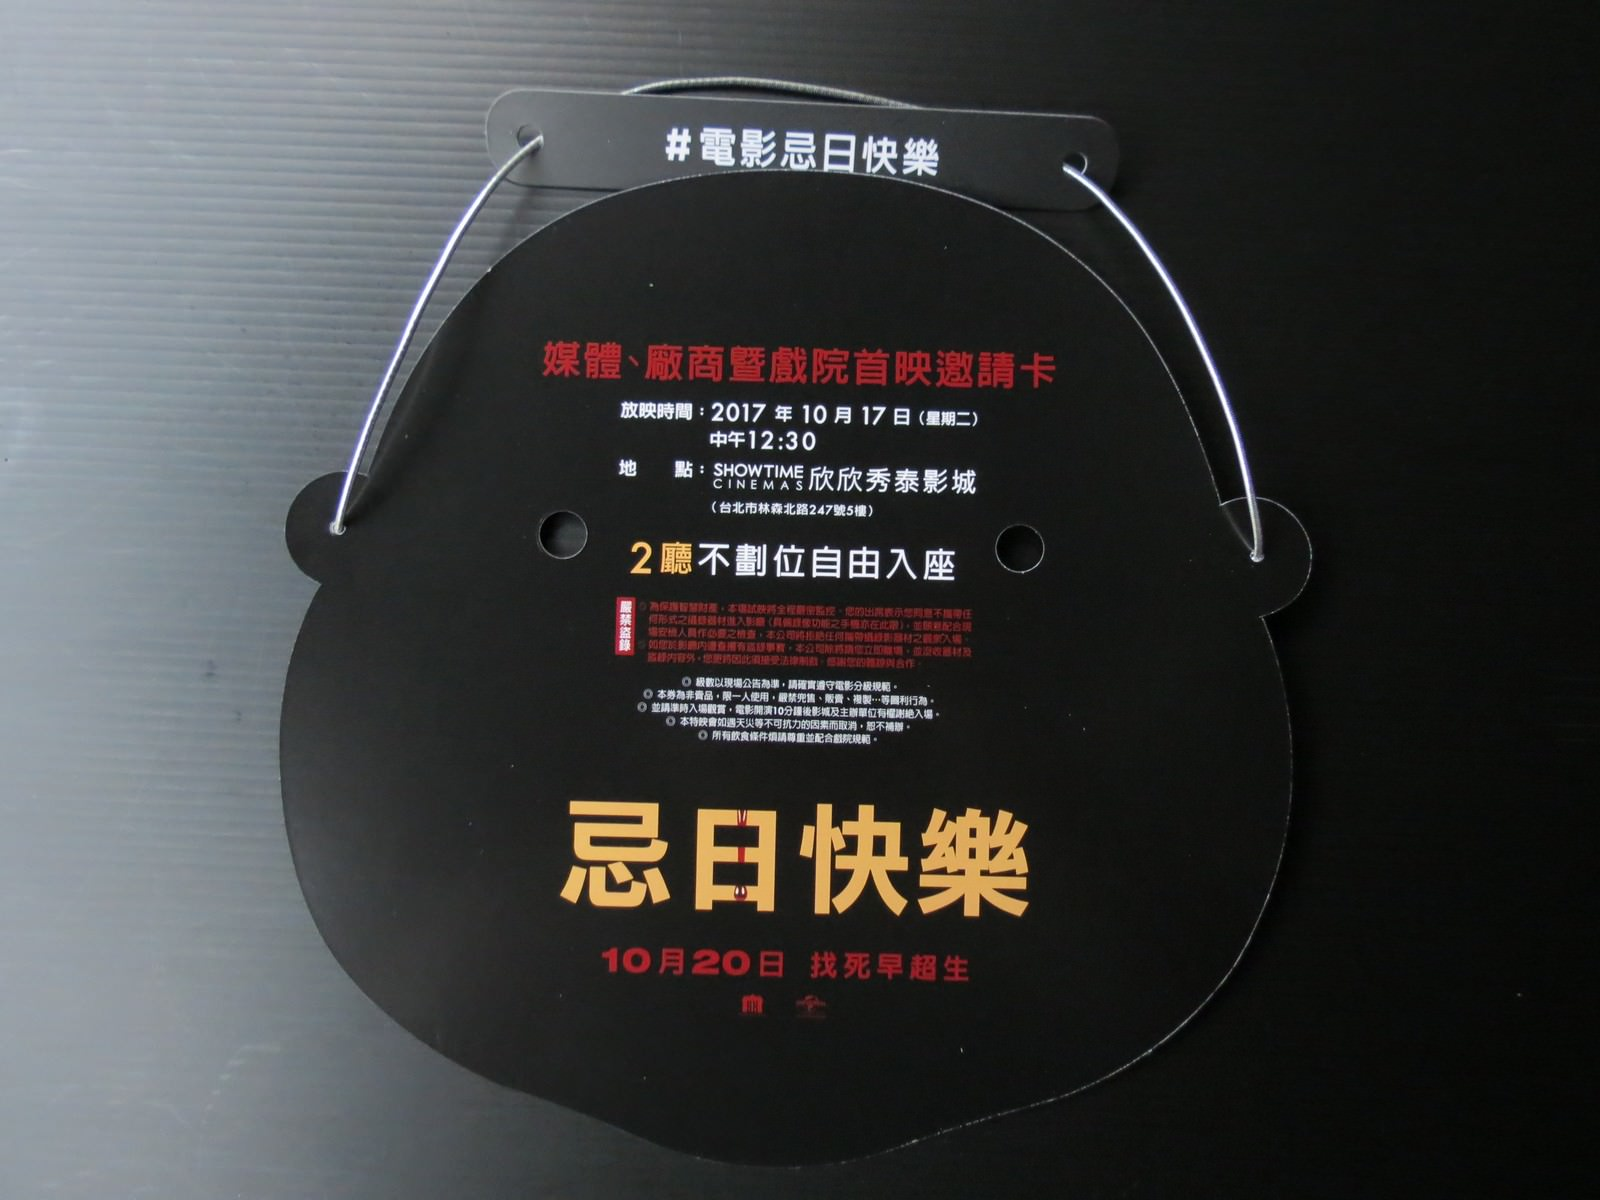 Movie, Happy Death Day(美國, 2017年) / 忌日快樂(台灣) / 忌日快乐(中國) / 死亡無限LOOP(香港), 特映會邀請卡